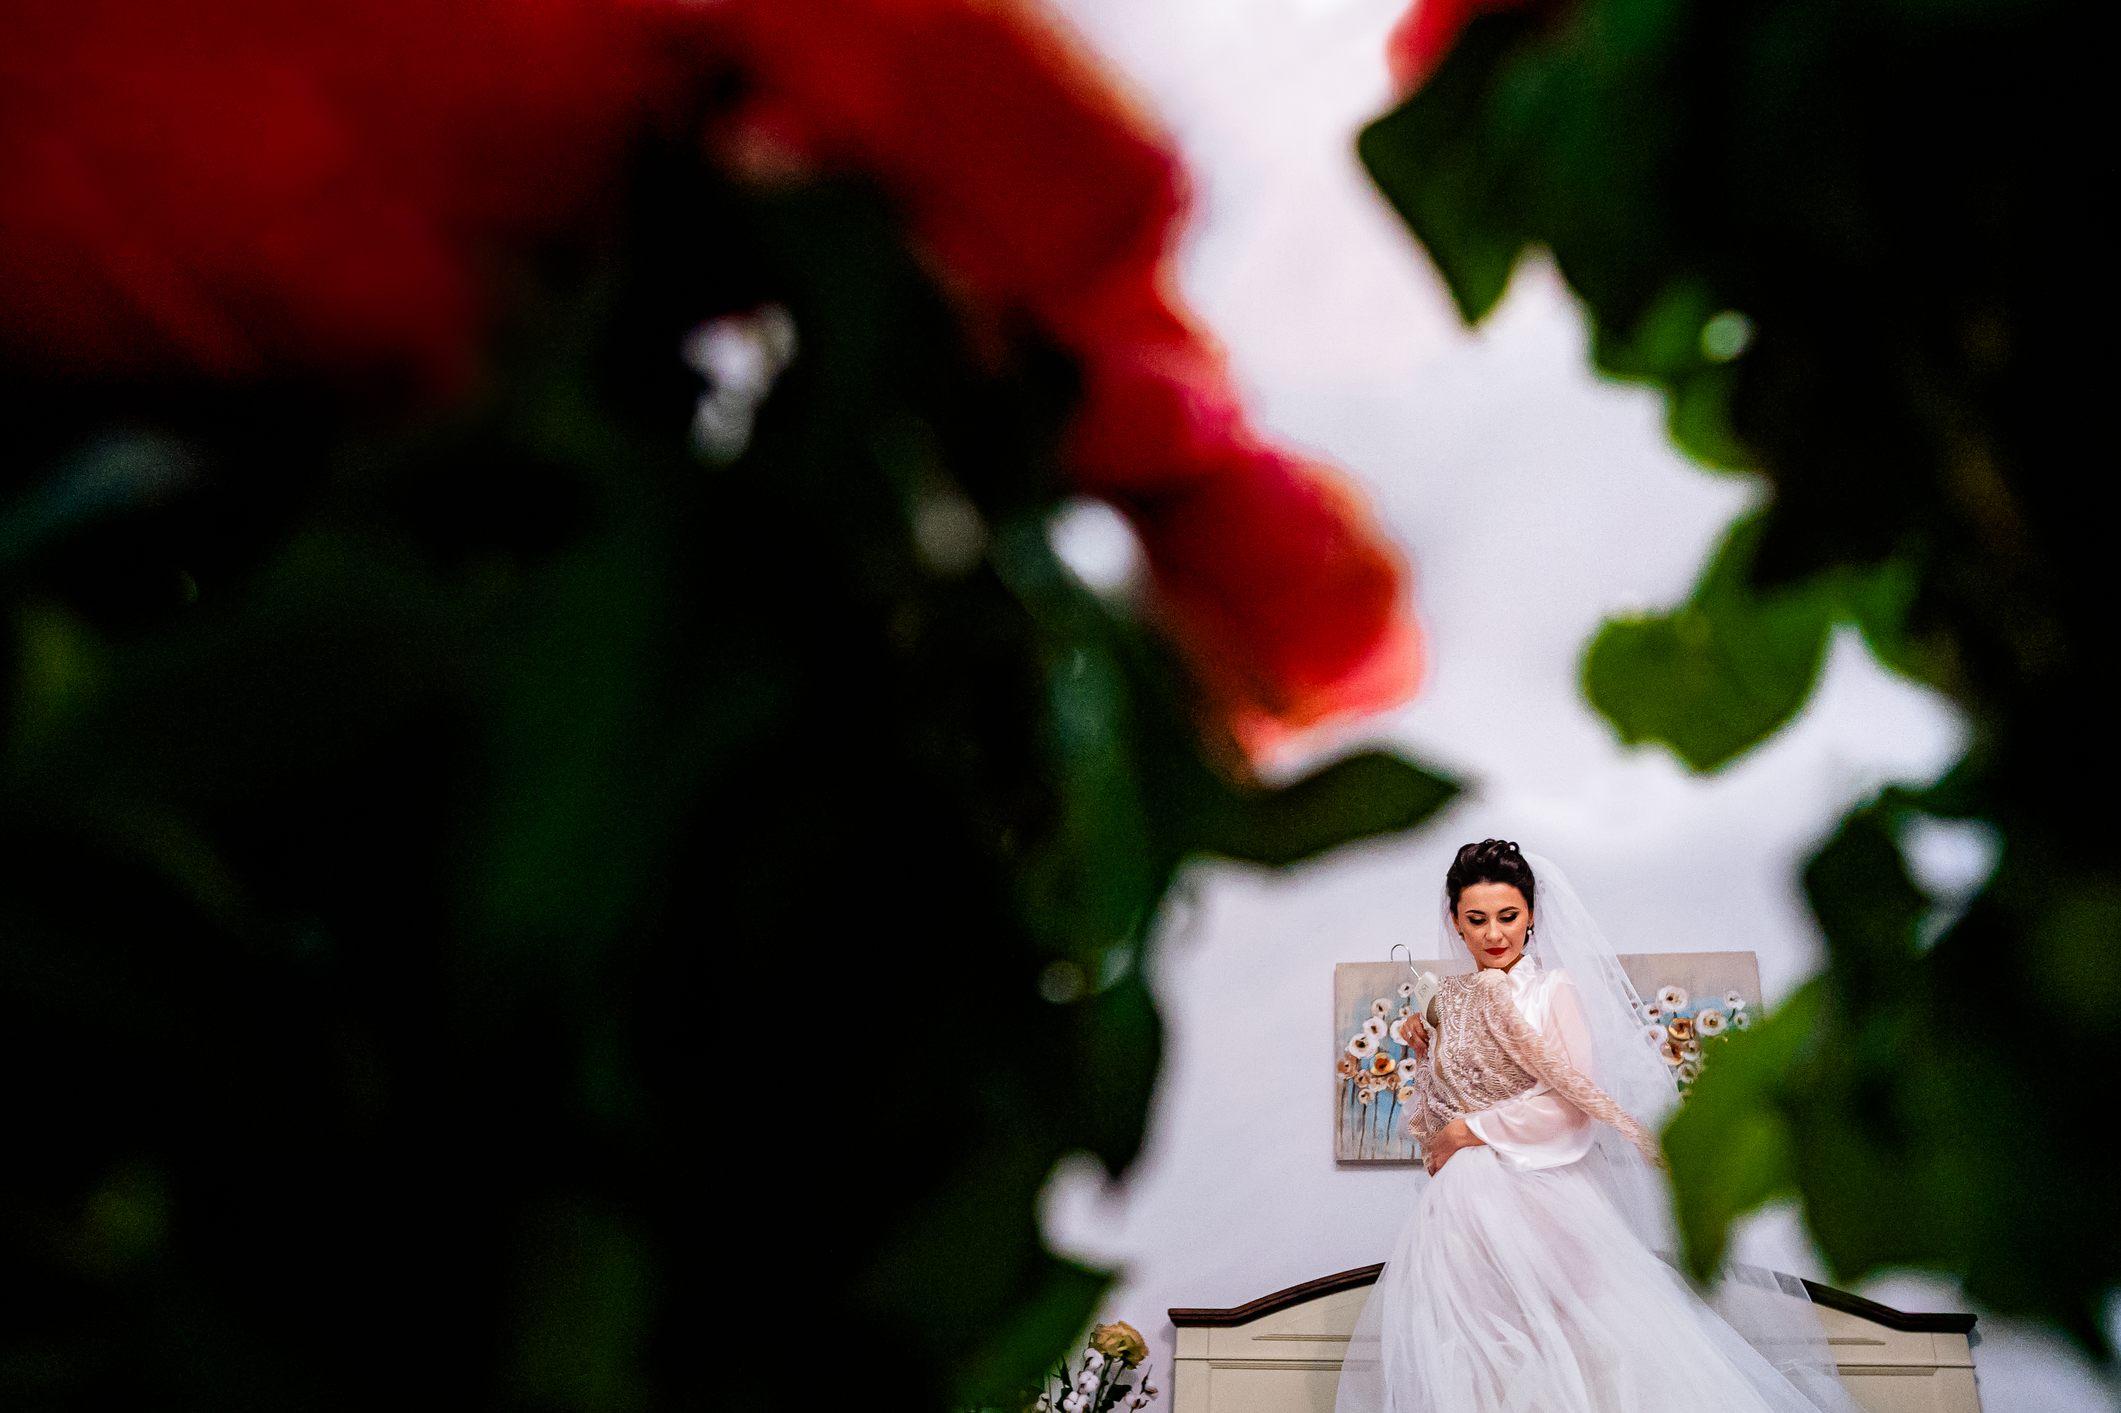 fotograf nunta bucuresti laurentiu nica  1 - Lorena & Matei | Fotografii nunta Bucuresti | Restaurant Domeniul cu Ciresi